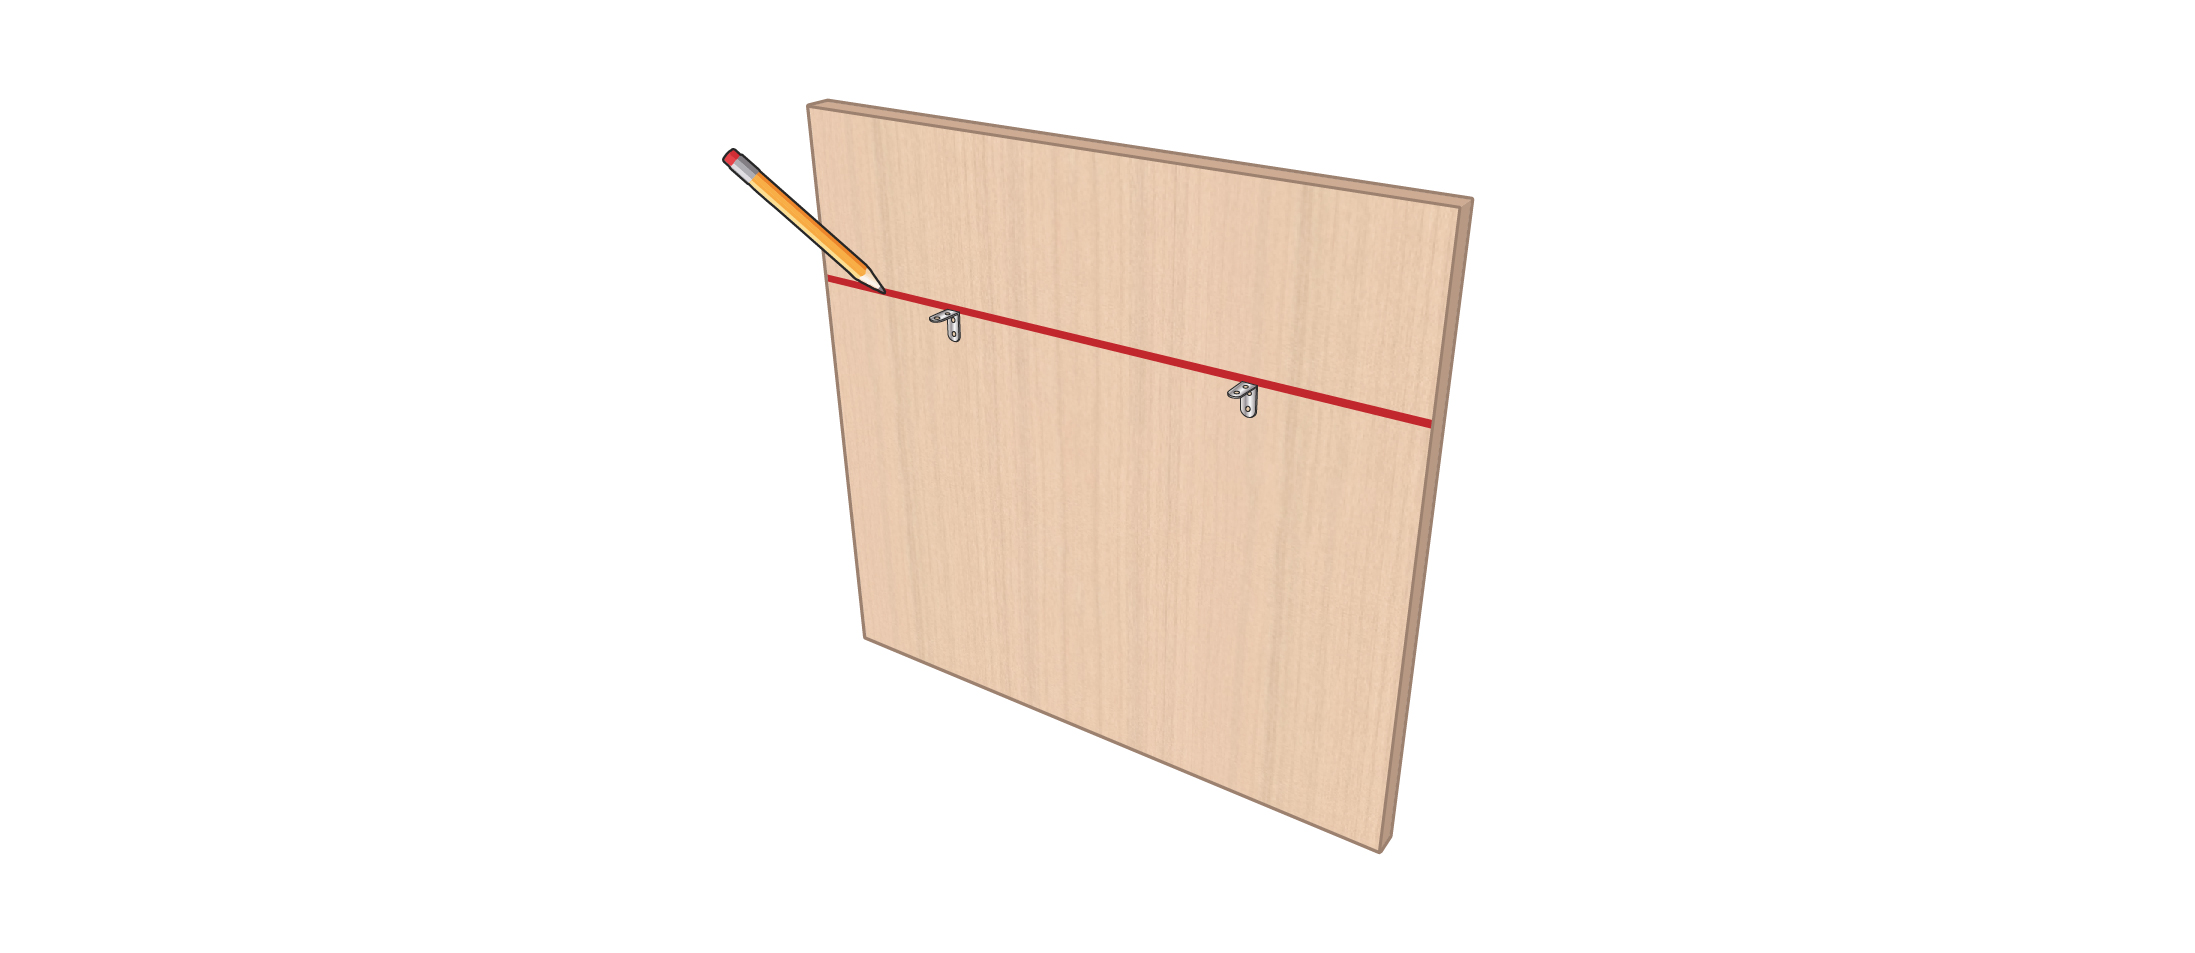 meuble vinyle DIY étape 1